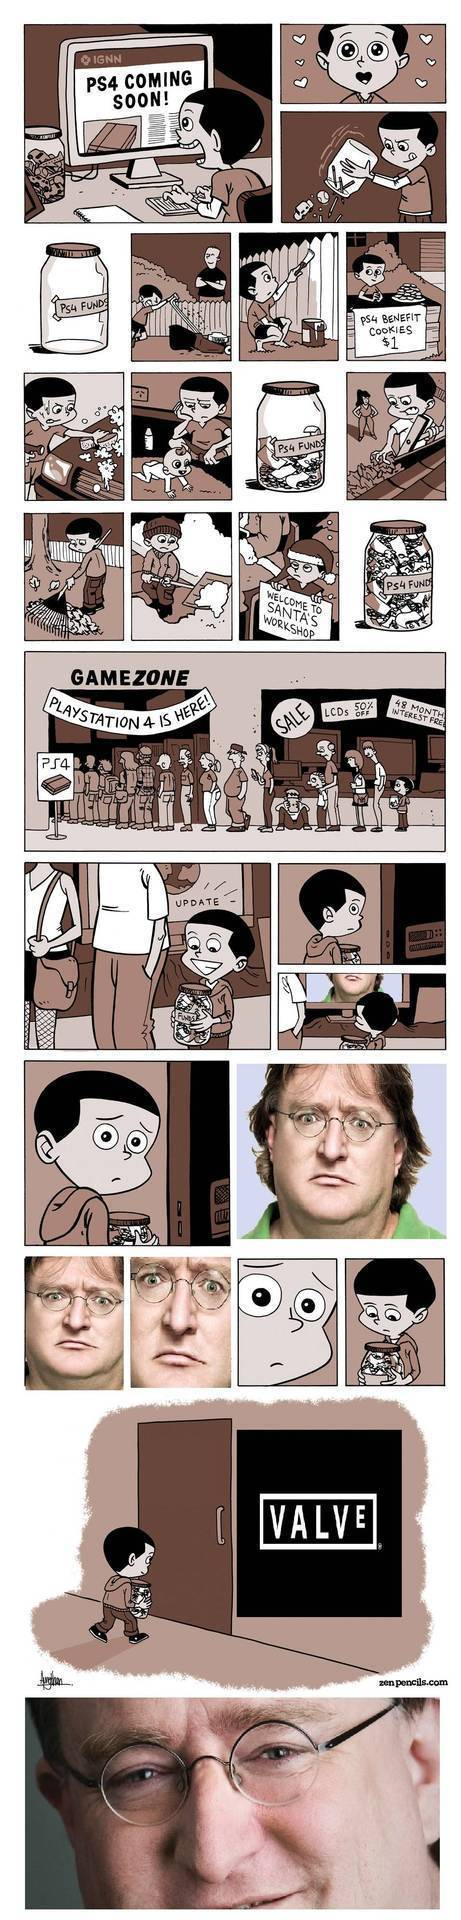 PS4 를 사기위해 돈을 모은 아이